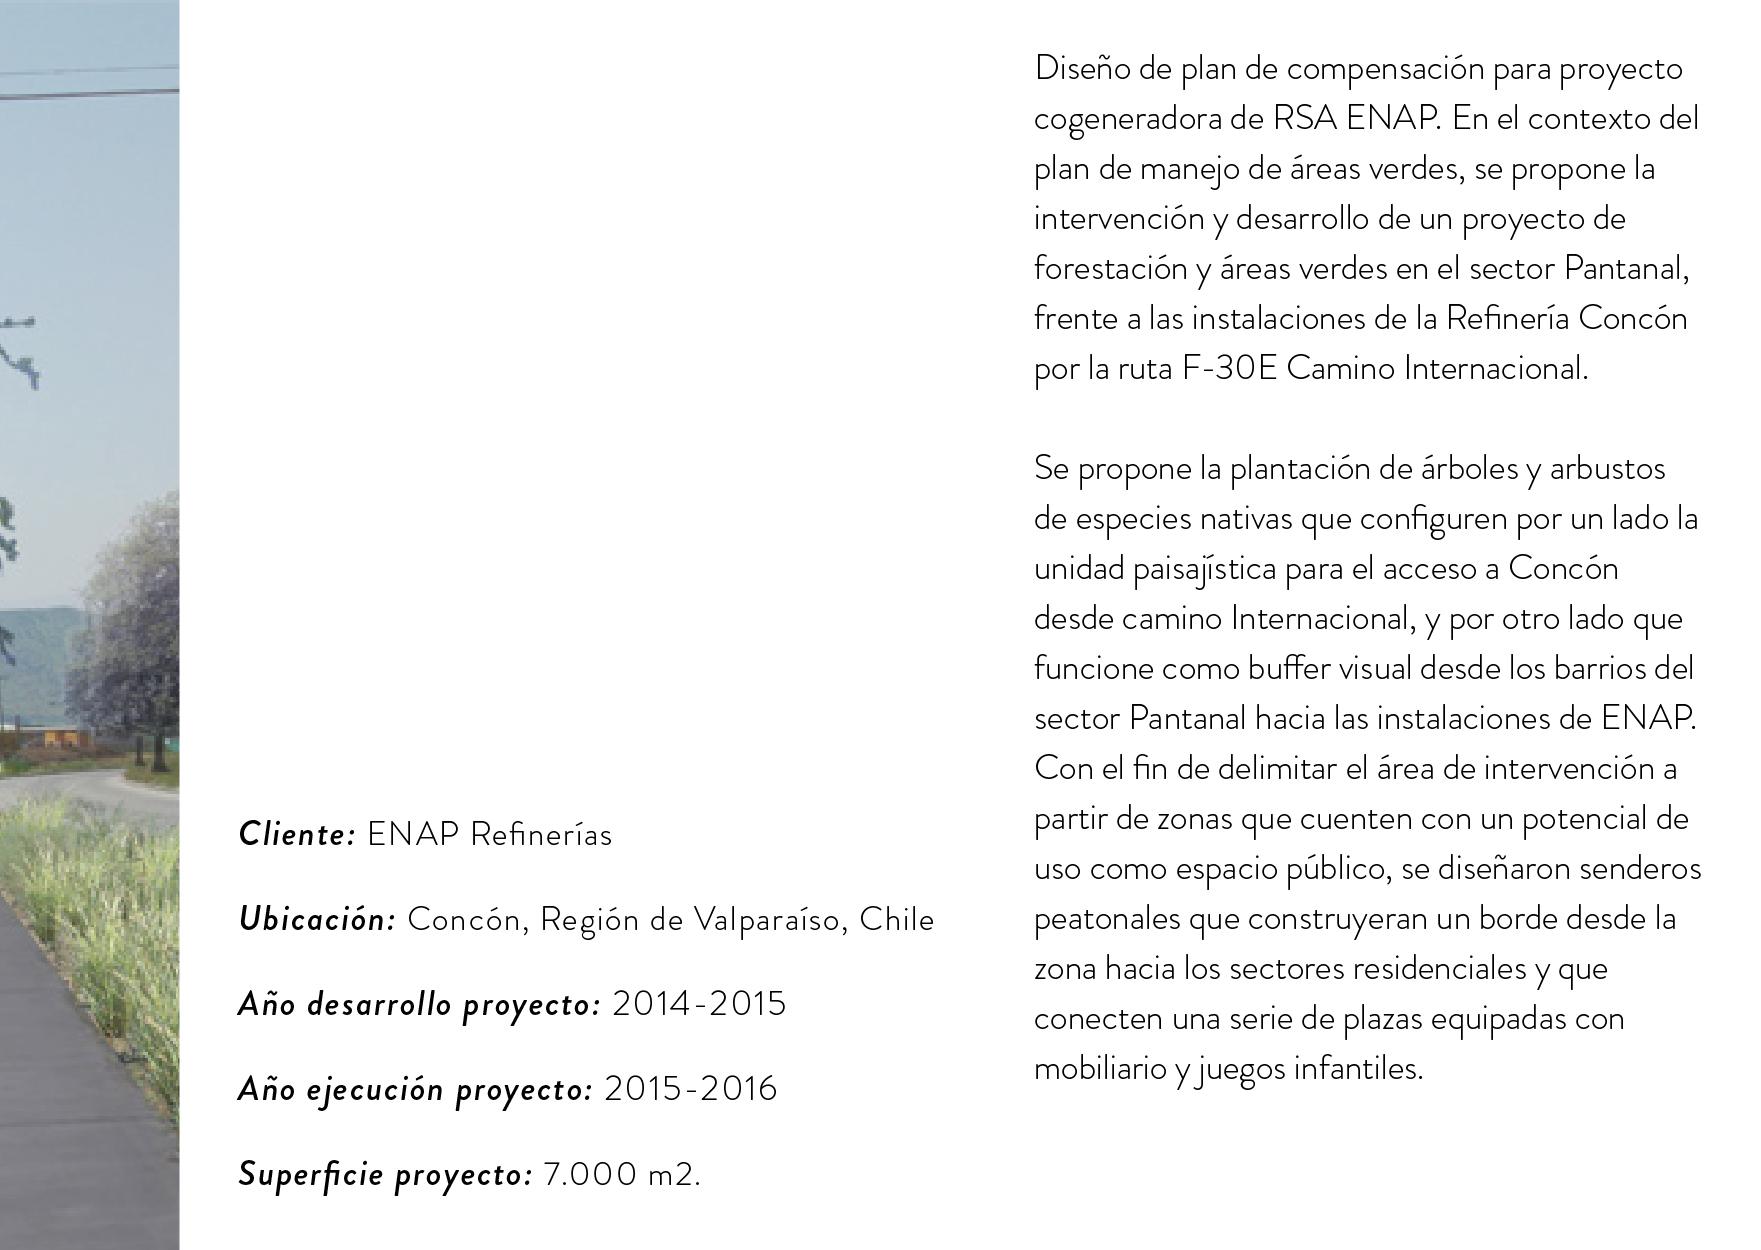 Formato Panoramico PLAN COMPENSACION ENAP-02.jpg